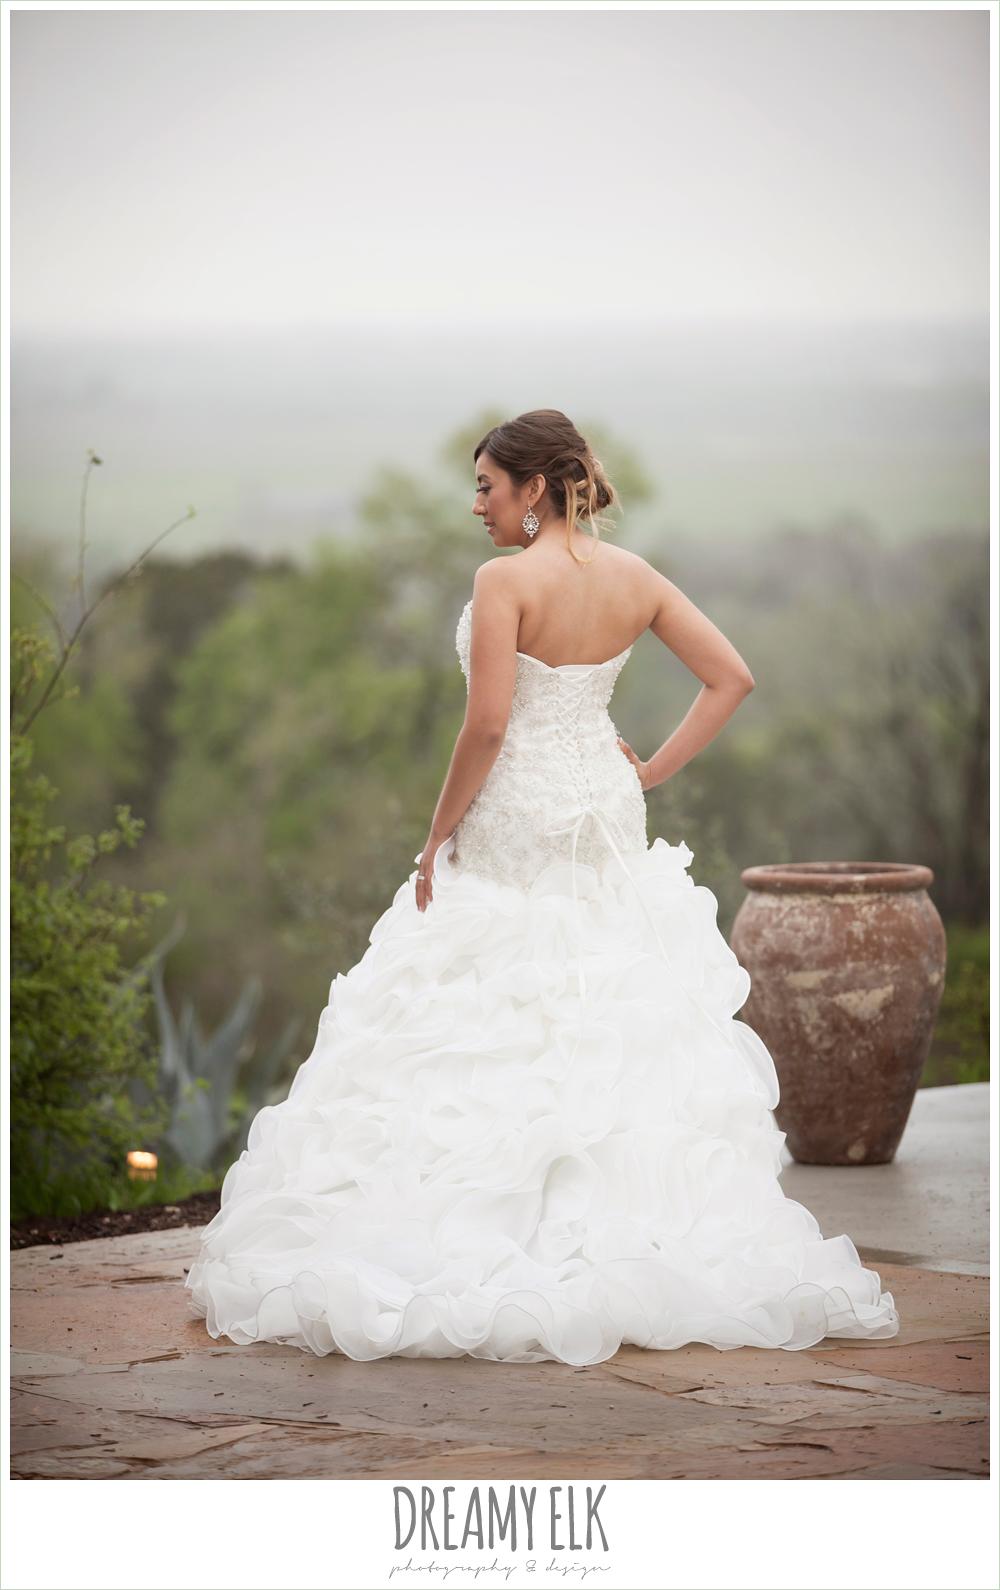 foggy wedding day, sweetheart strapless ruffle skirt wedding dress, austin spring wedding {dreamy elk photography and design}